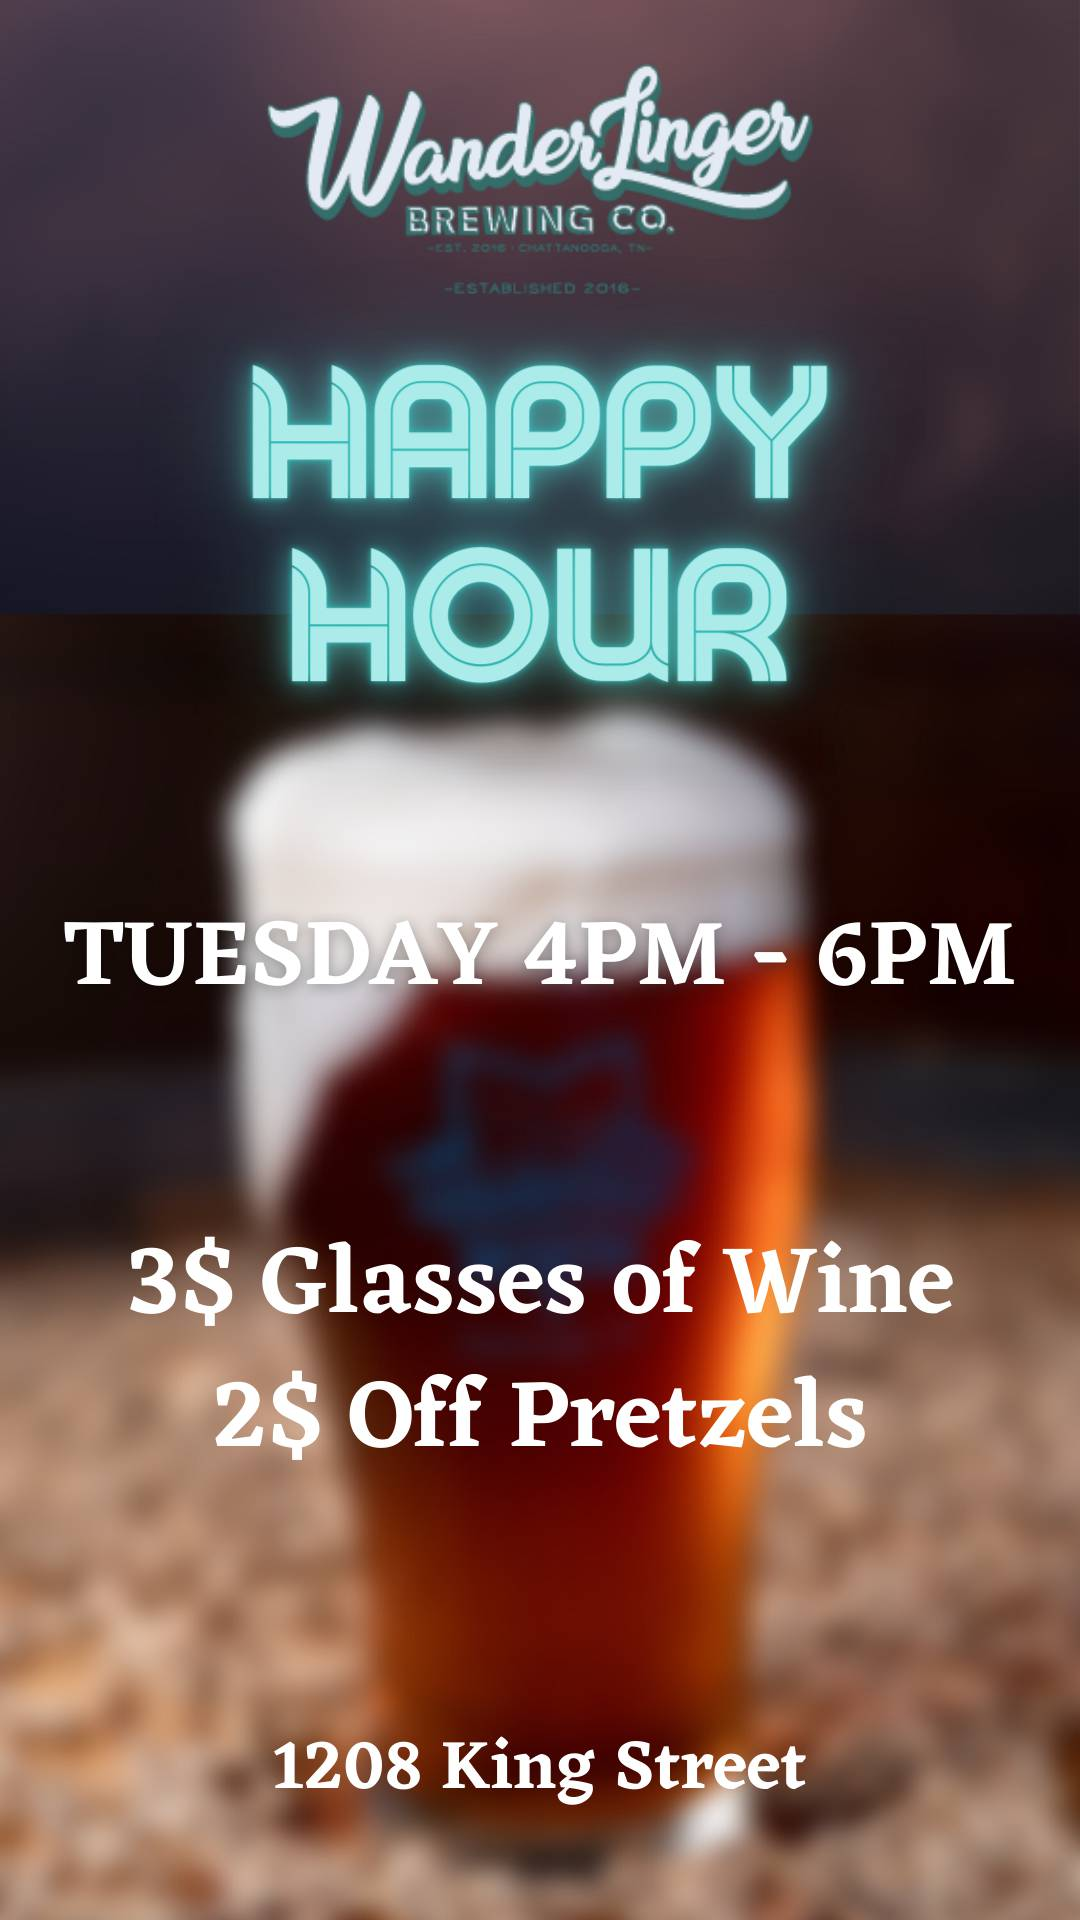 Tuesday Happy Hour! $3 Wine/$2 Off Pretzels